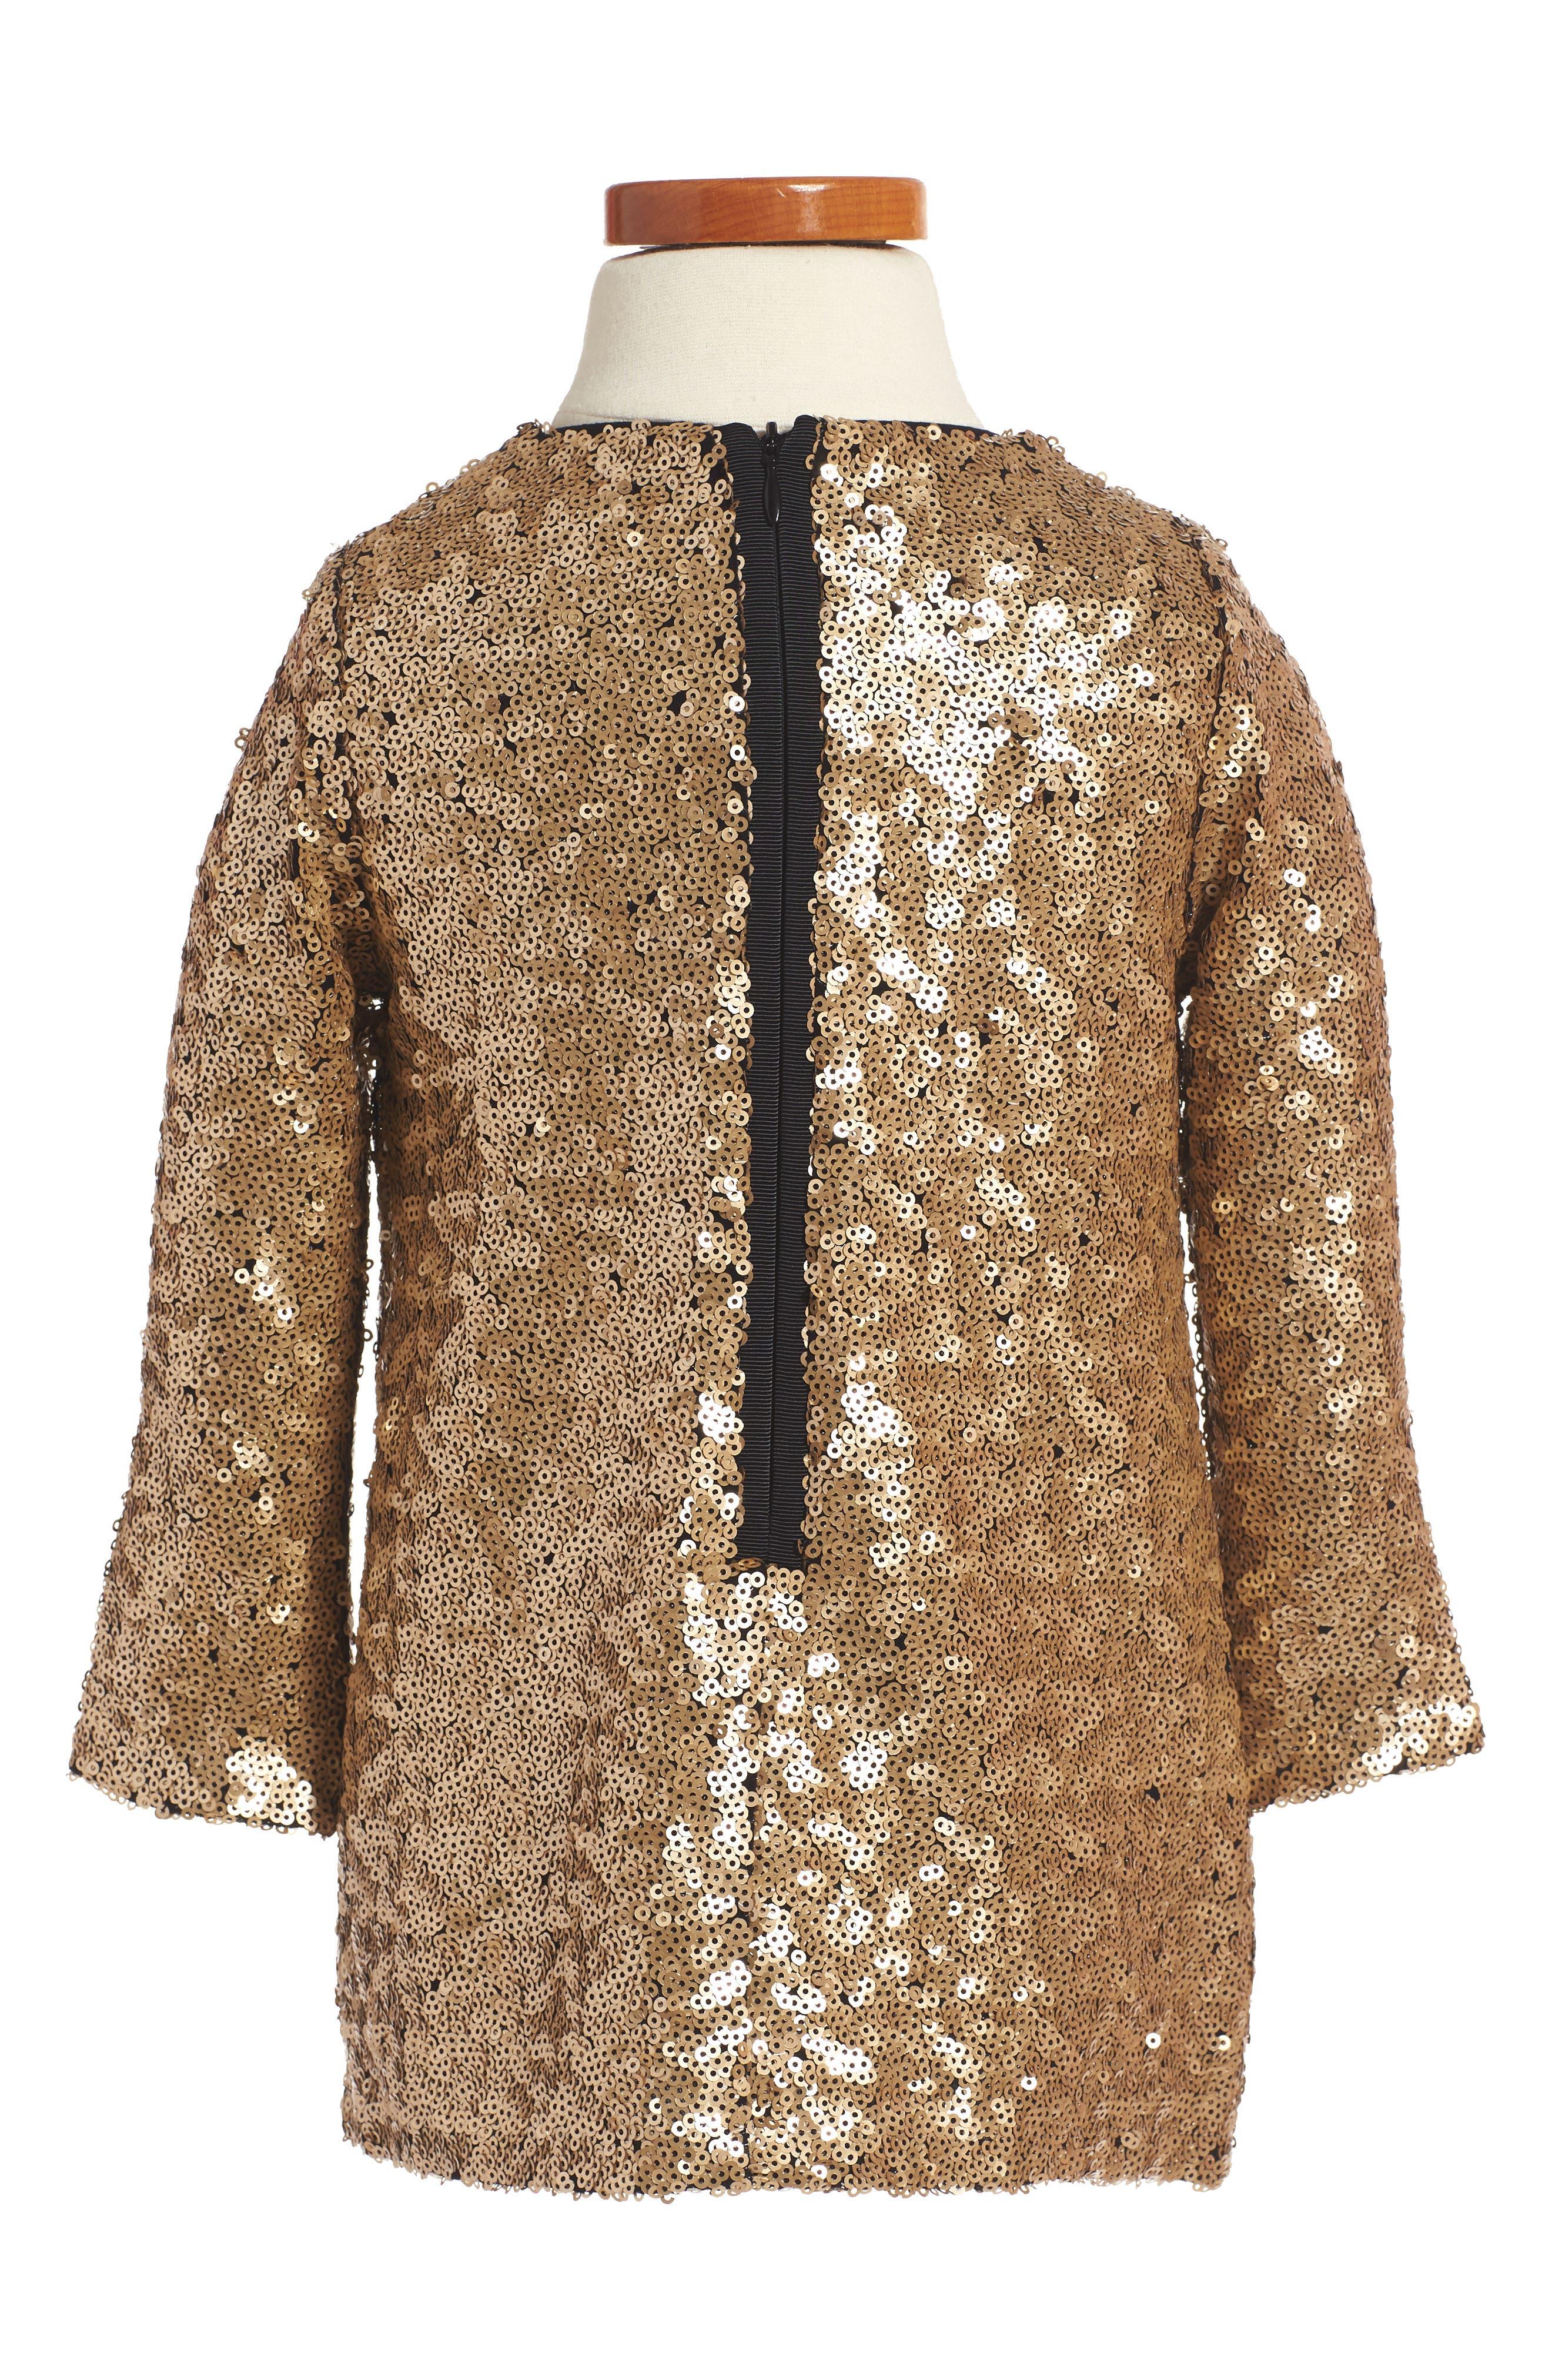 Paradise Sequin Shift Dress,                             Alternate thumbnail 2, color,                             Gold Yellow